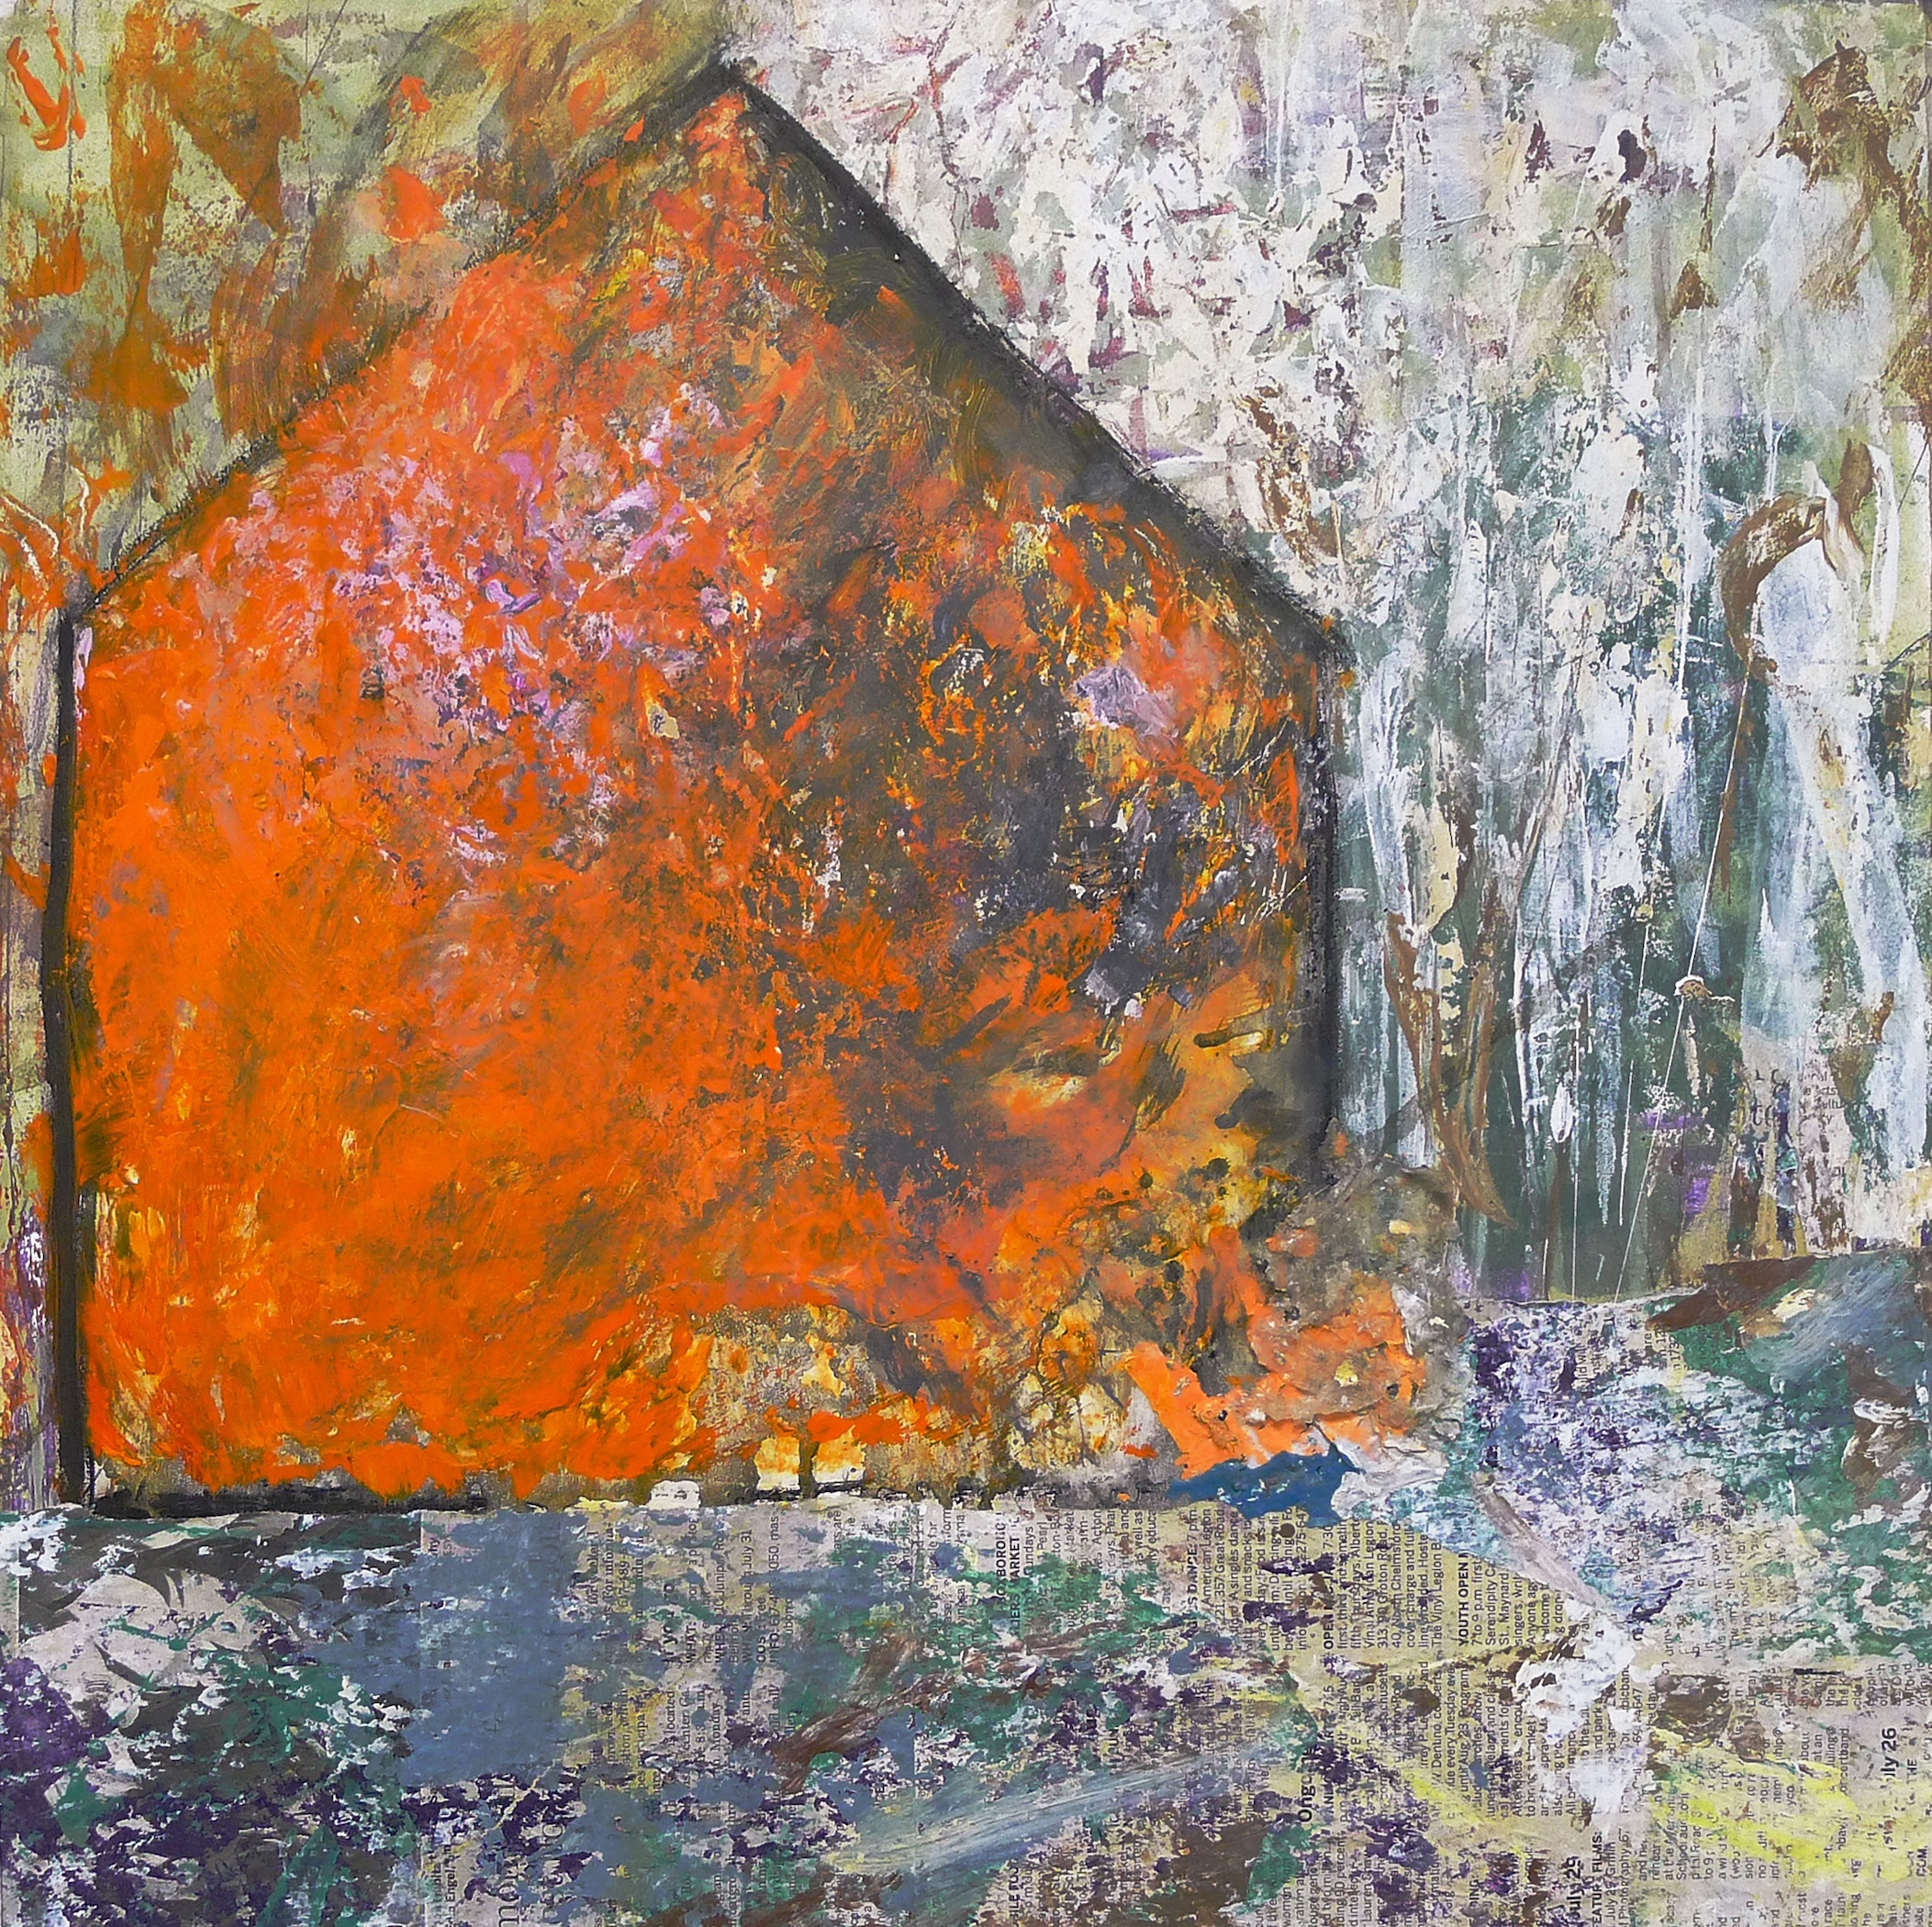 Brenda Cirioni,  Barn Series: Cover,  Mixed media painting, 20x20